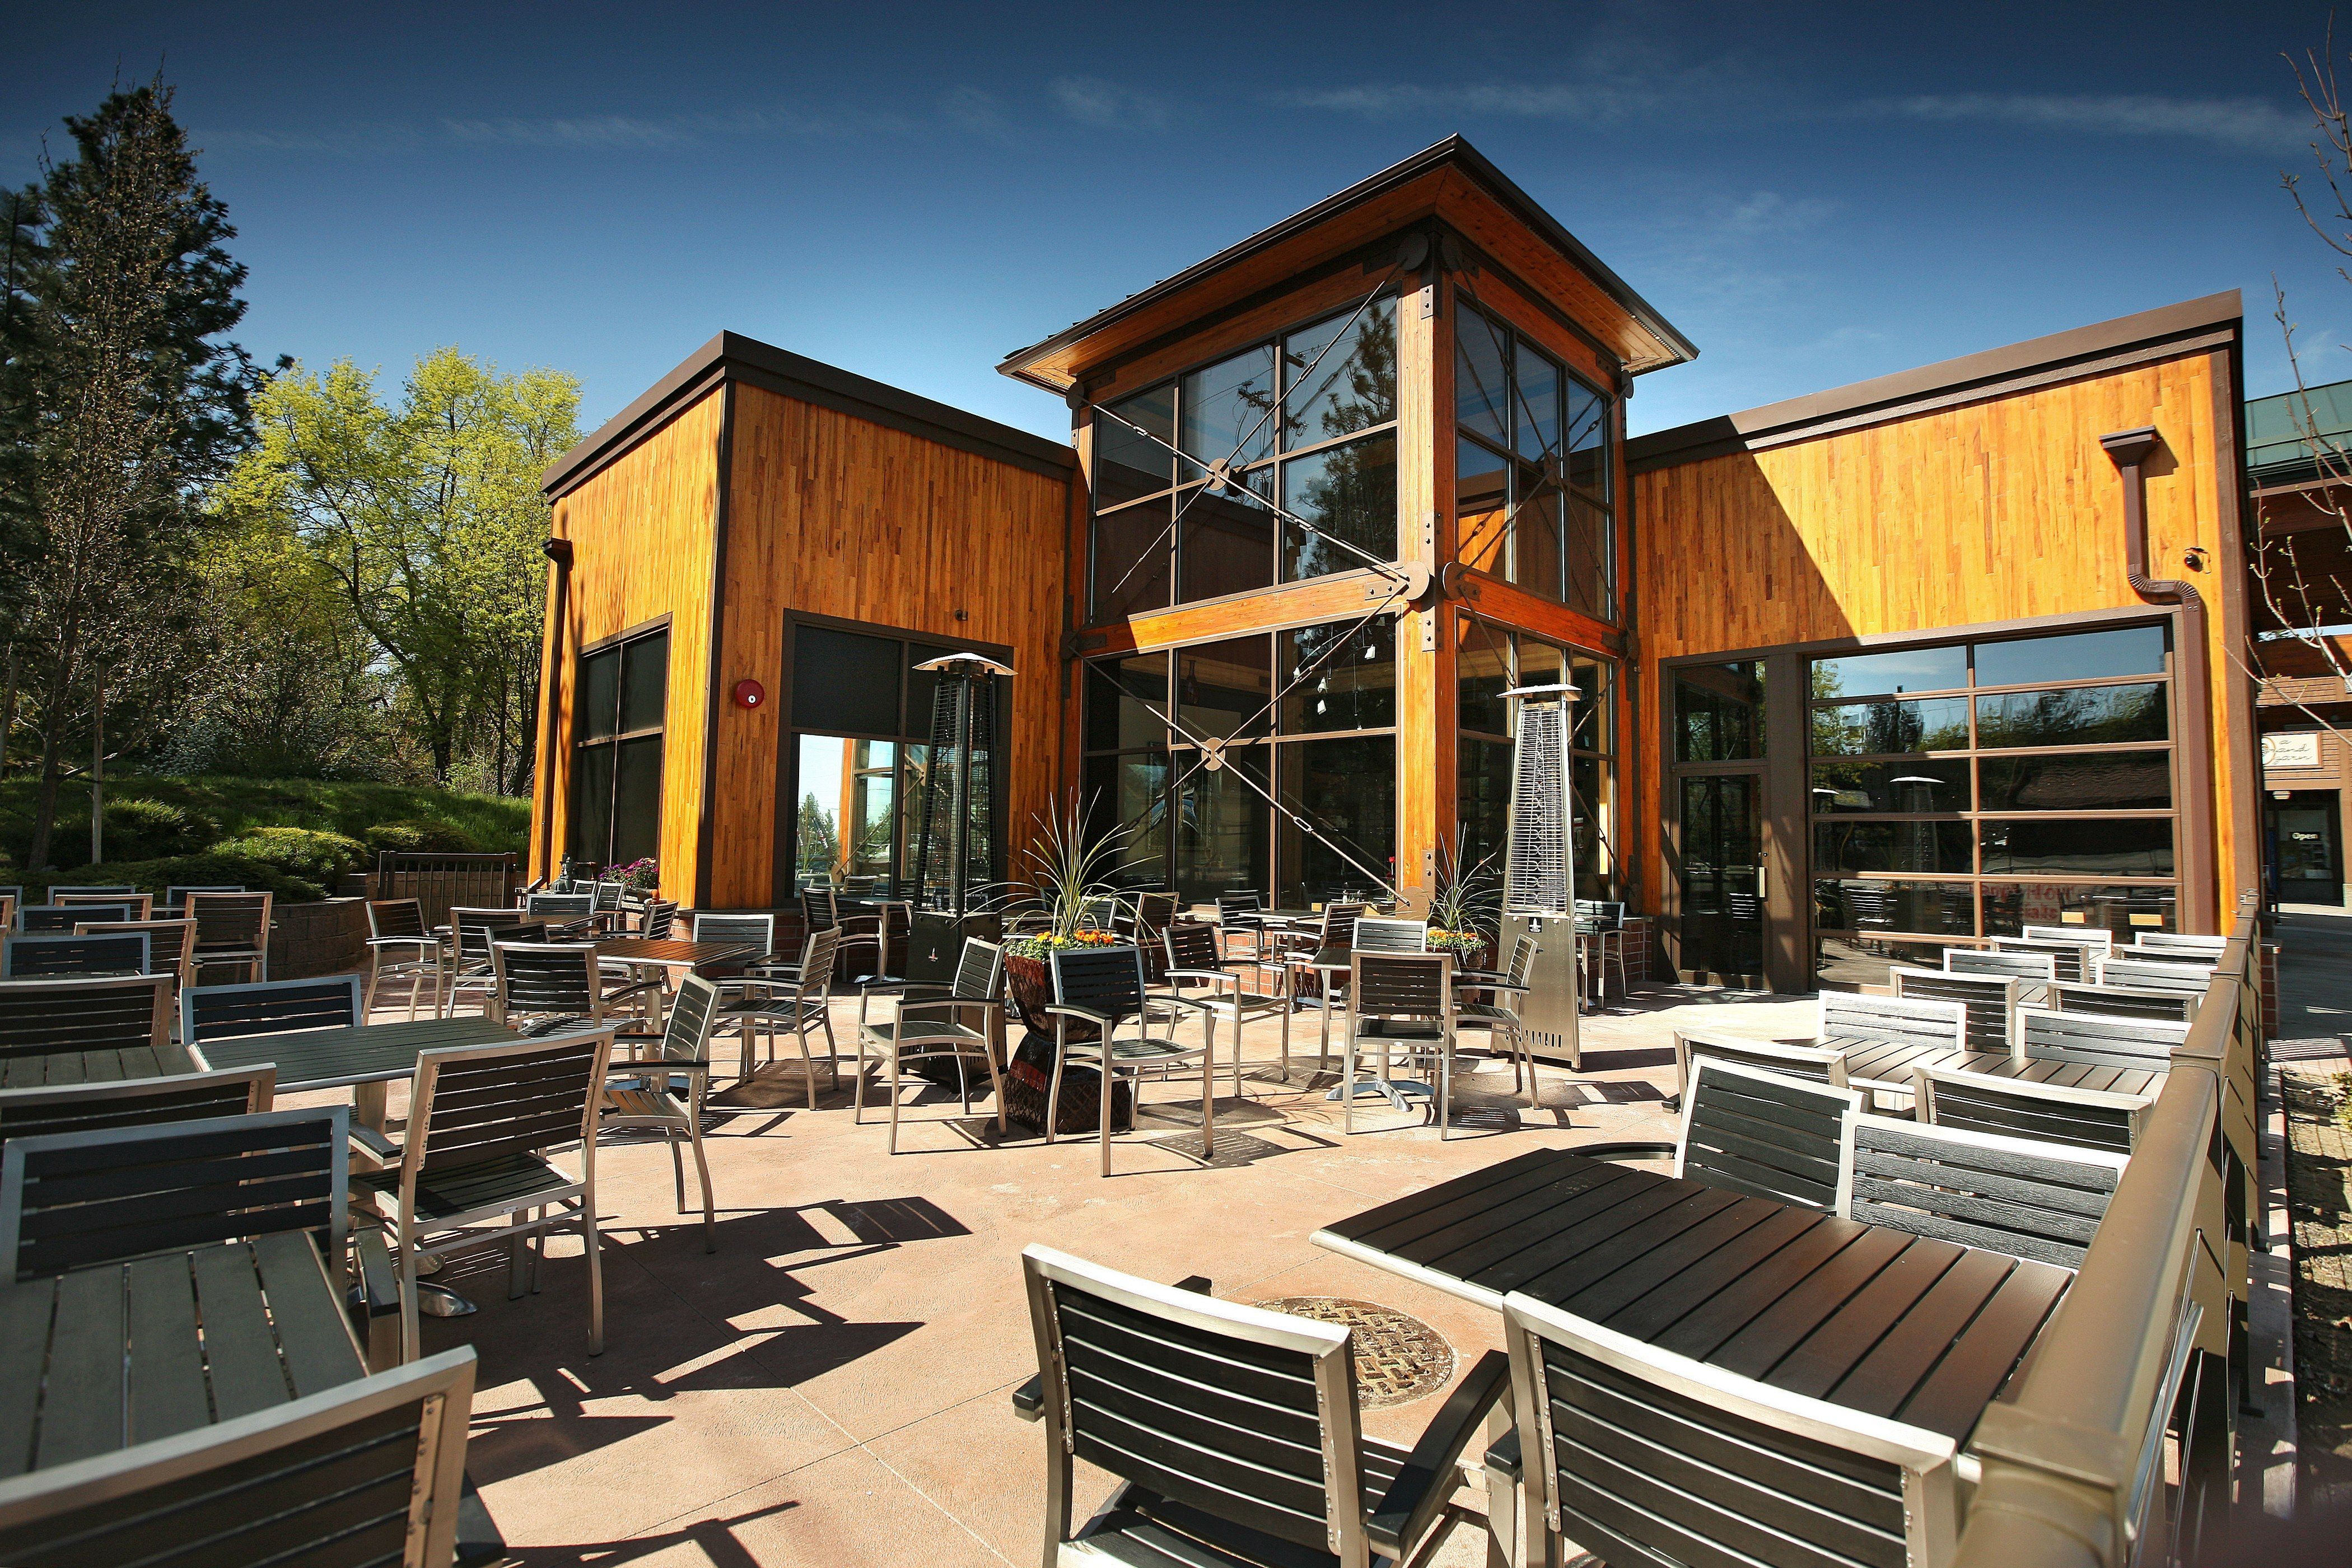 Savory Restaurant On The South Hill Of Spokane Wa